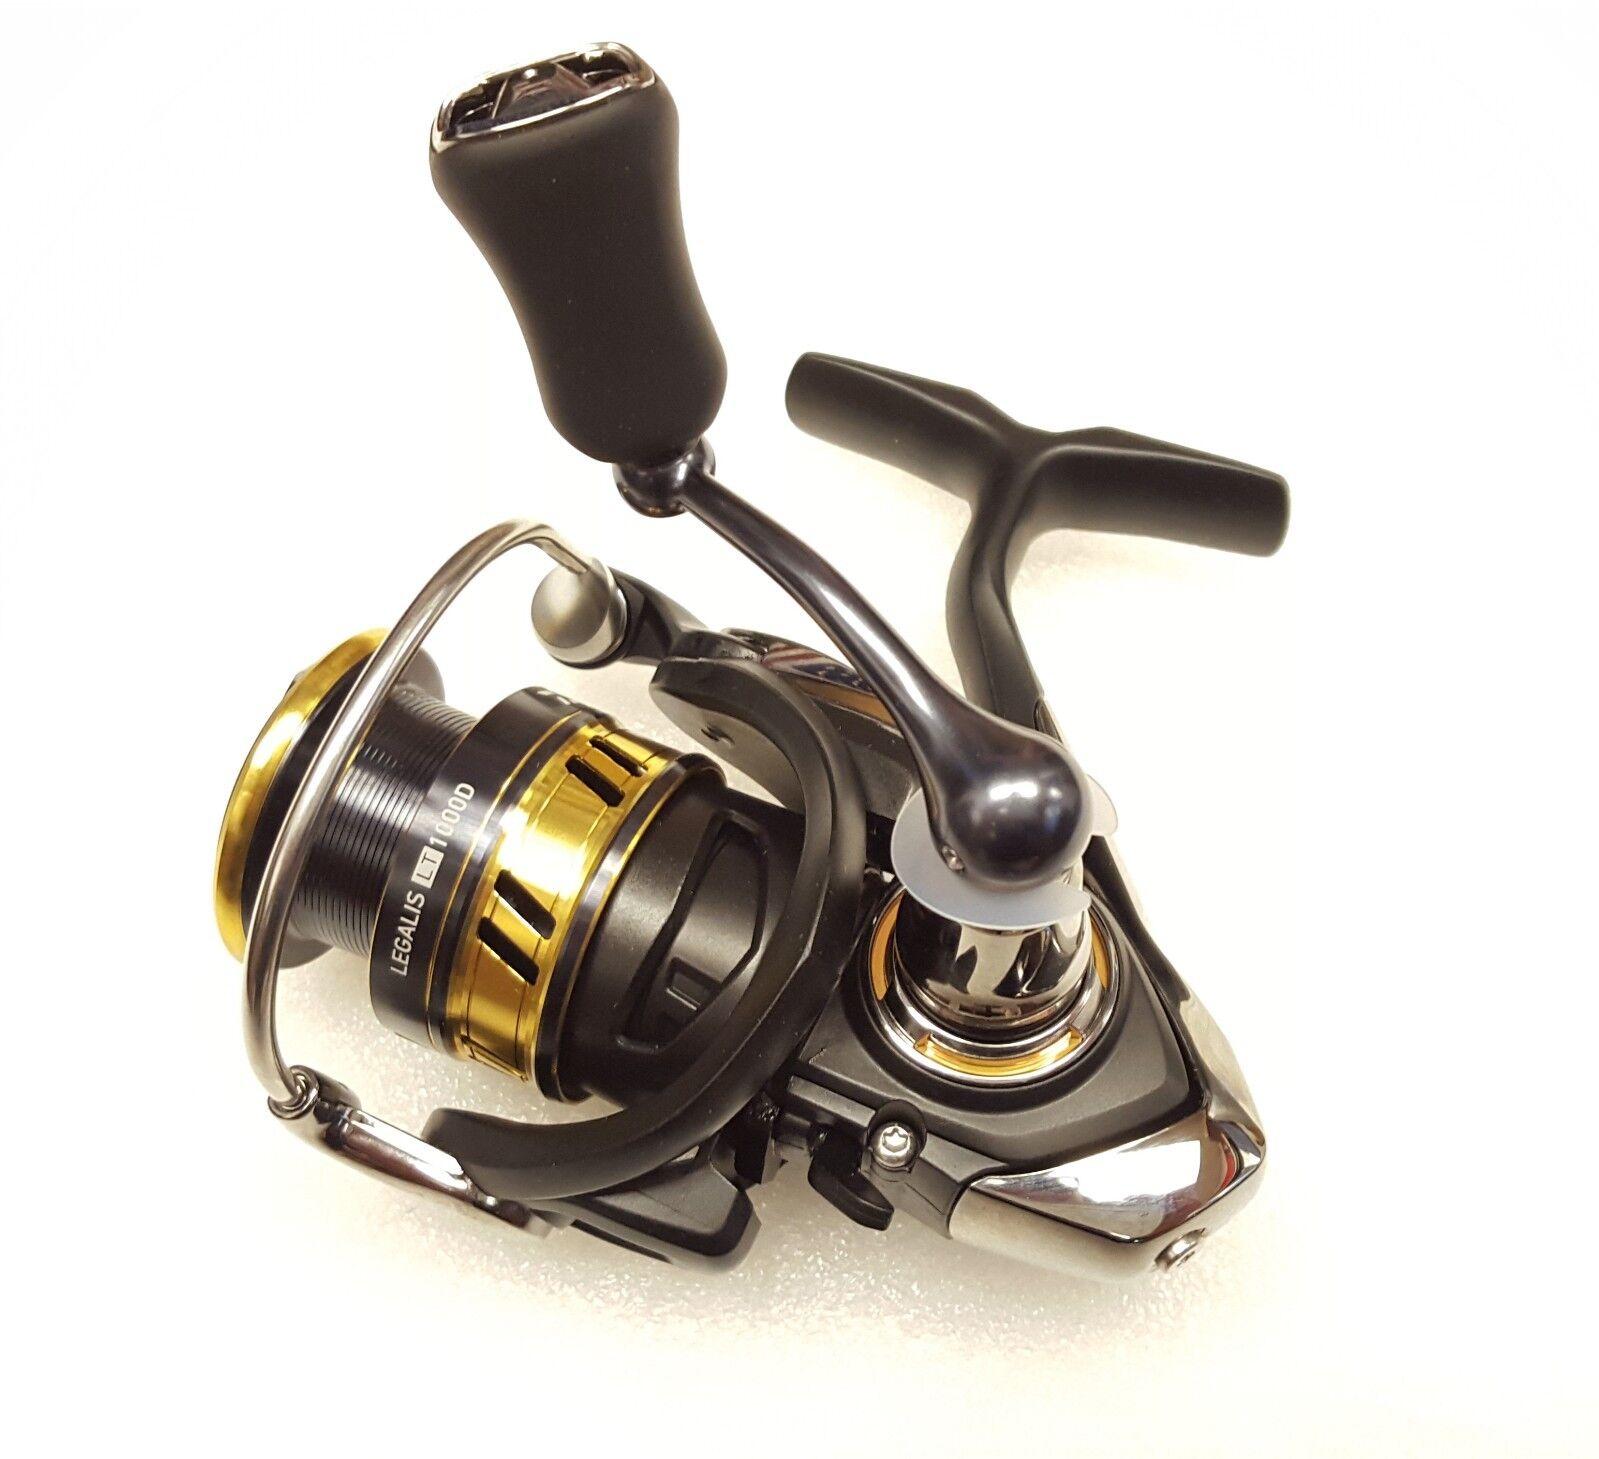 Daiwa Daiwa Daiwa Legalis LT 5.2:1 Left/Right Hand Spinning Fishing Reel - LGLT1000D 040a1b